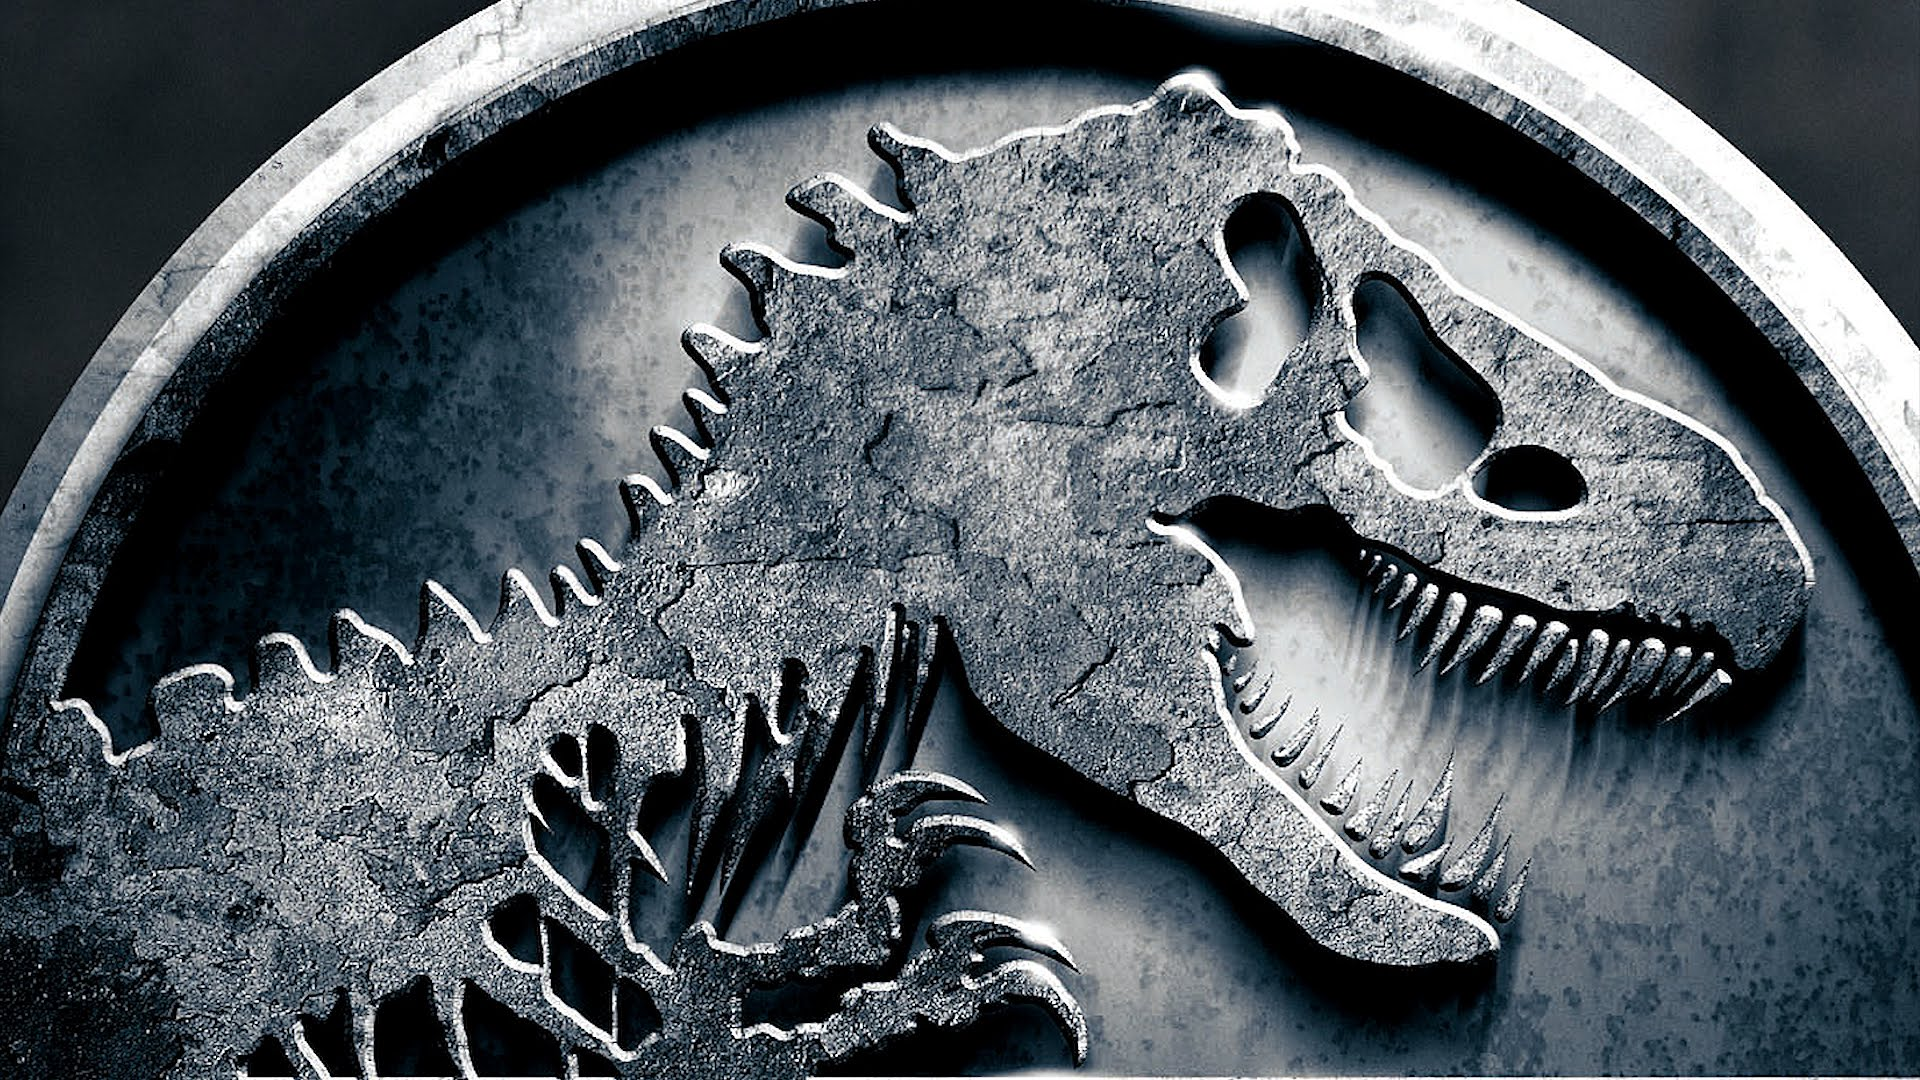 Jurassic World wallpaper 8